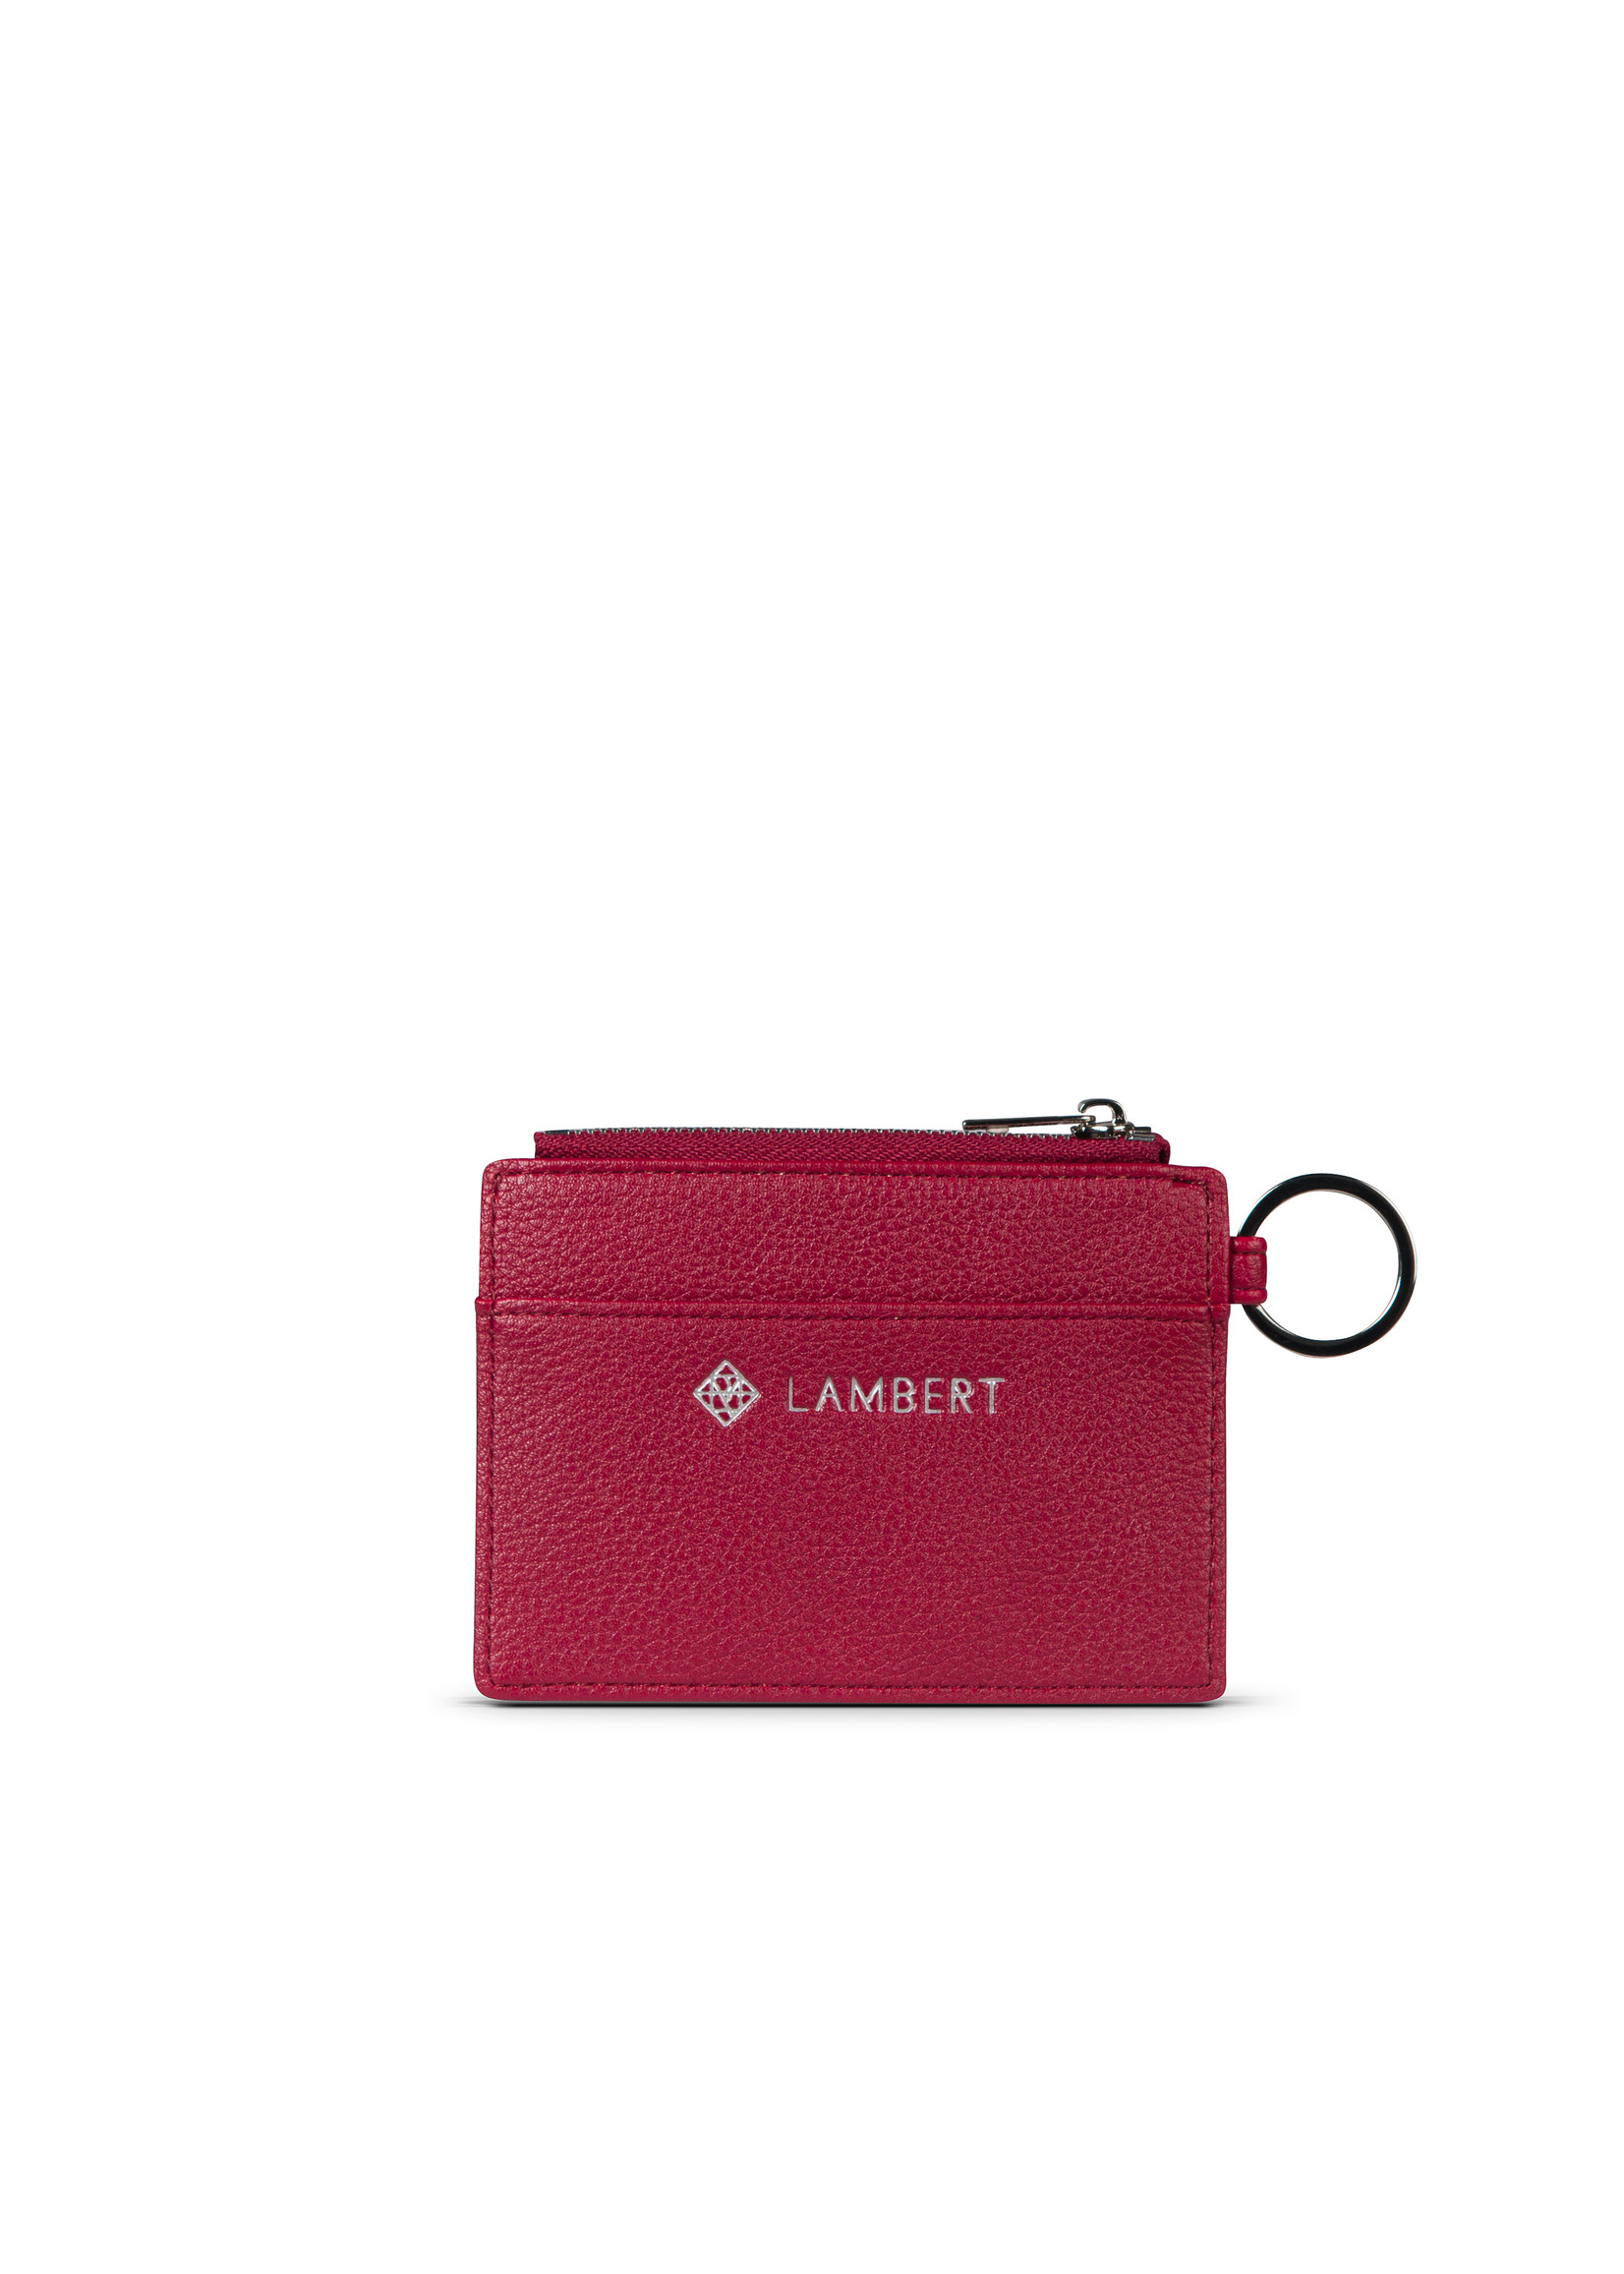 Lambert The LAURA - Vegan Leather Card Holder